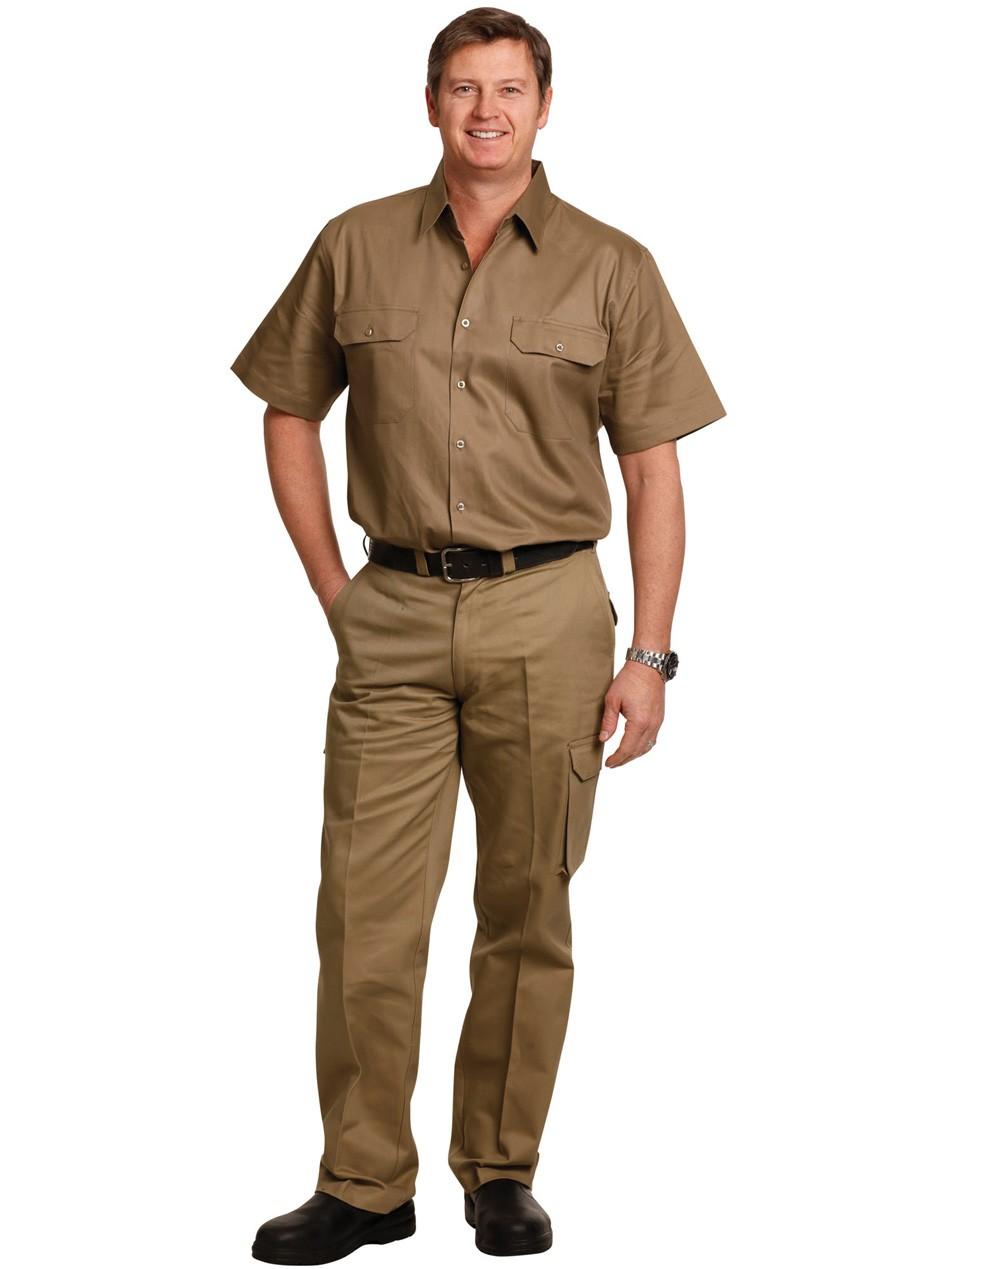 Winning Spirit Men's Heavy Cotton Pre-Shrunk Drill Pants Regular Size